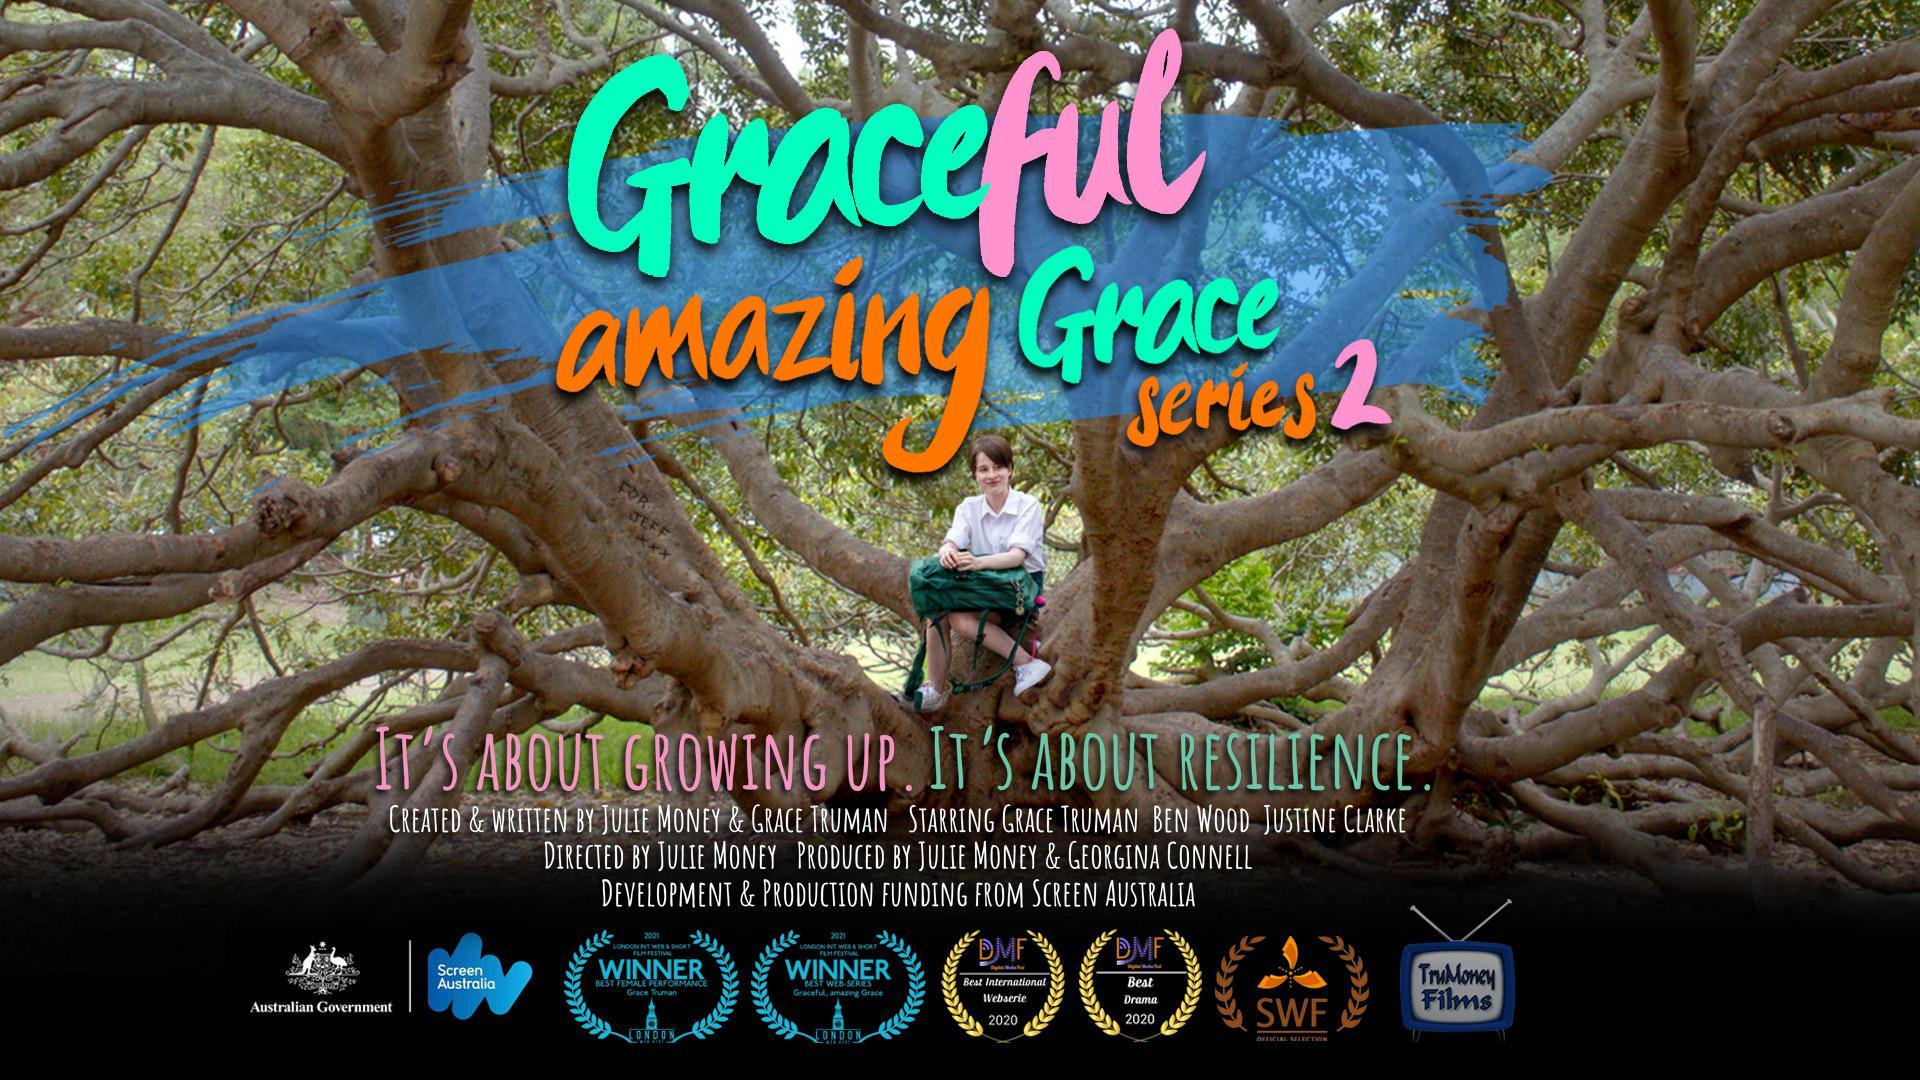 Graceful, amazing Grace series 2